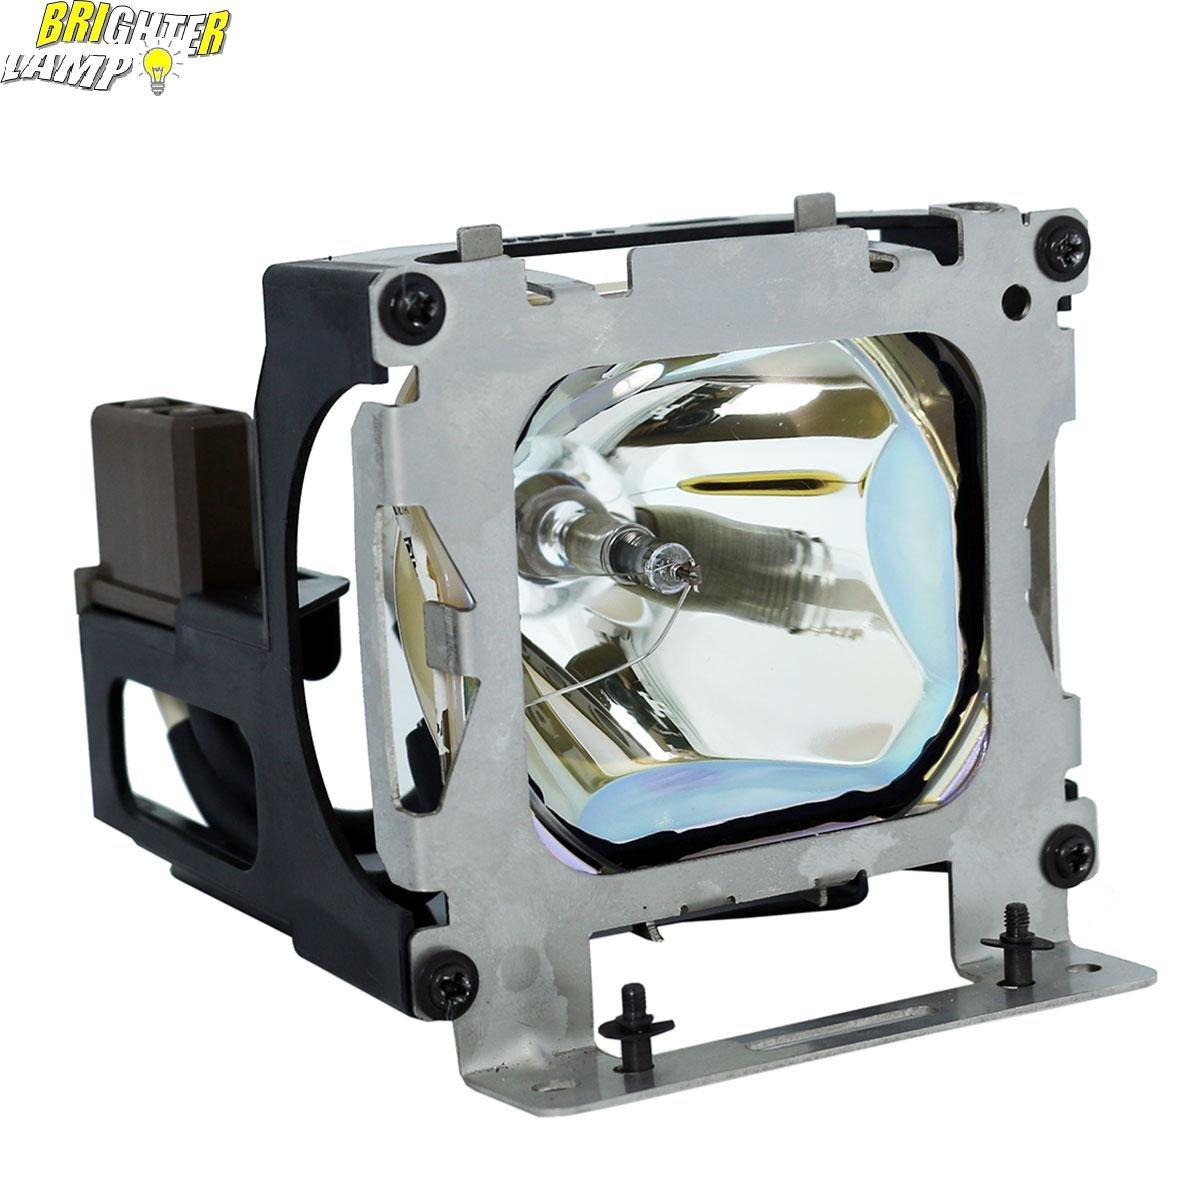 Brighter Lamp DT00231 プロジェクターランプ 【ハウジング付き/高輝度/長寿命】for Hitachi日立 交換用   B0779Q4QKW